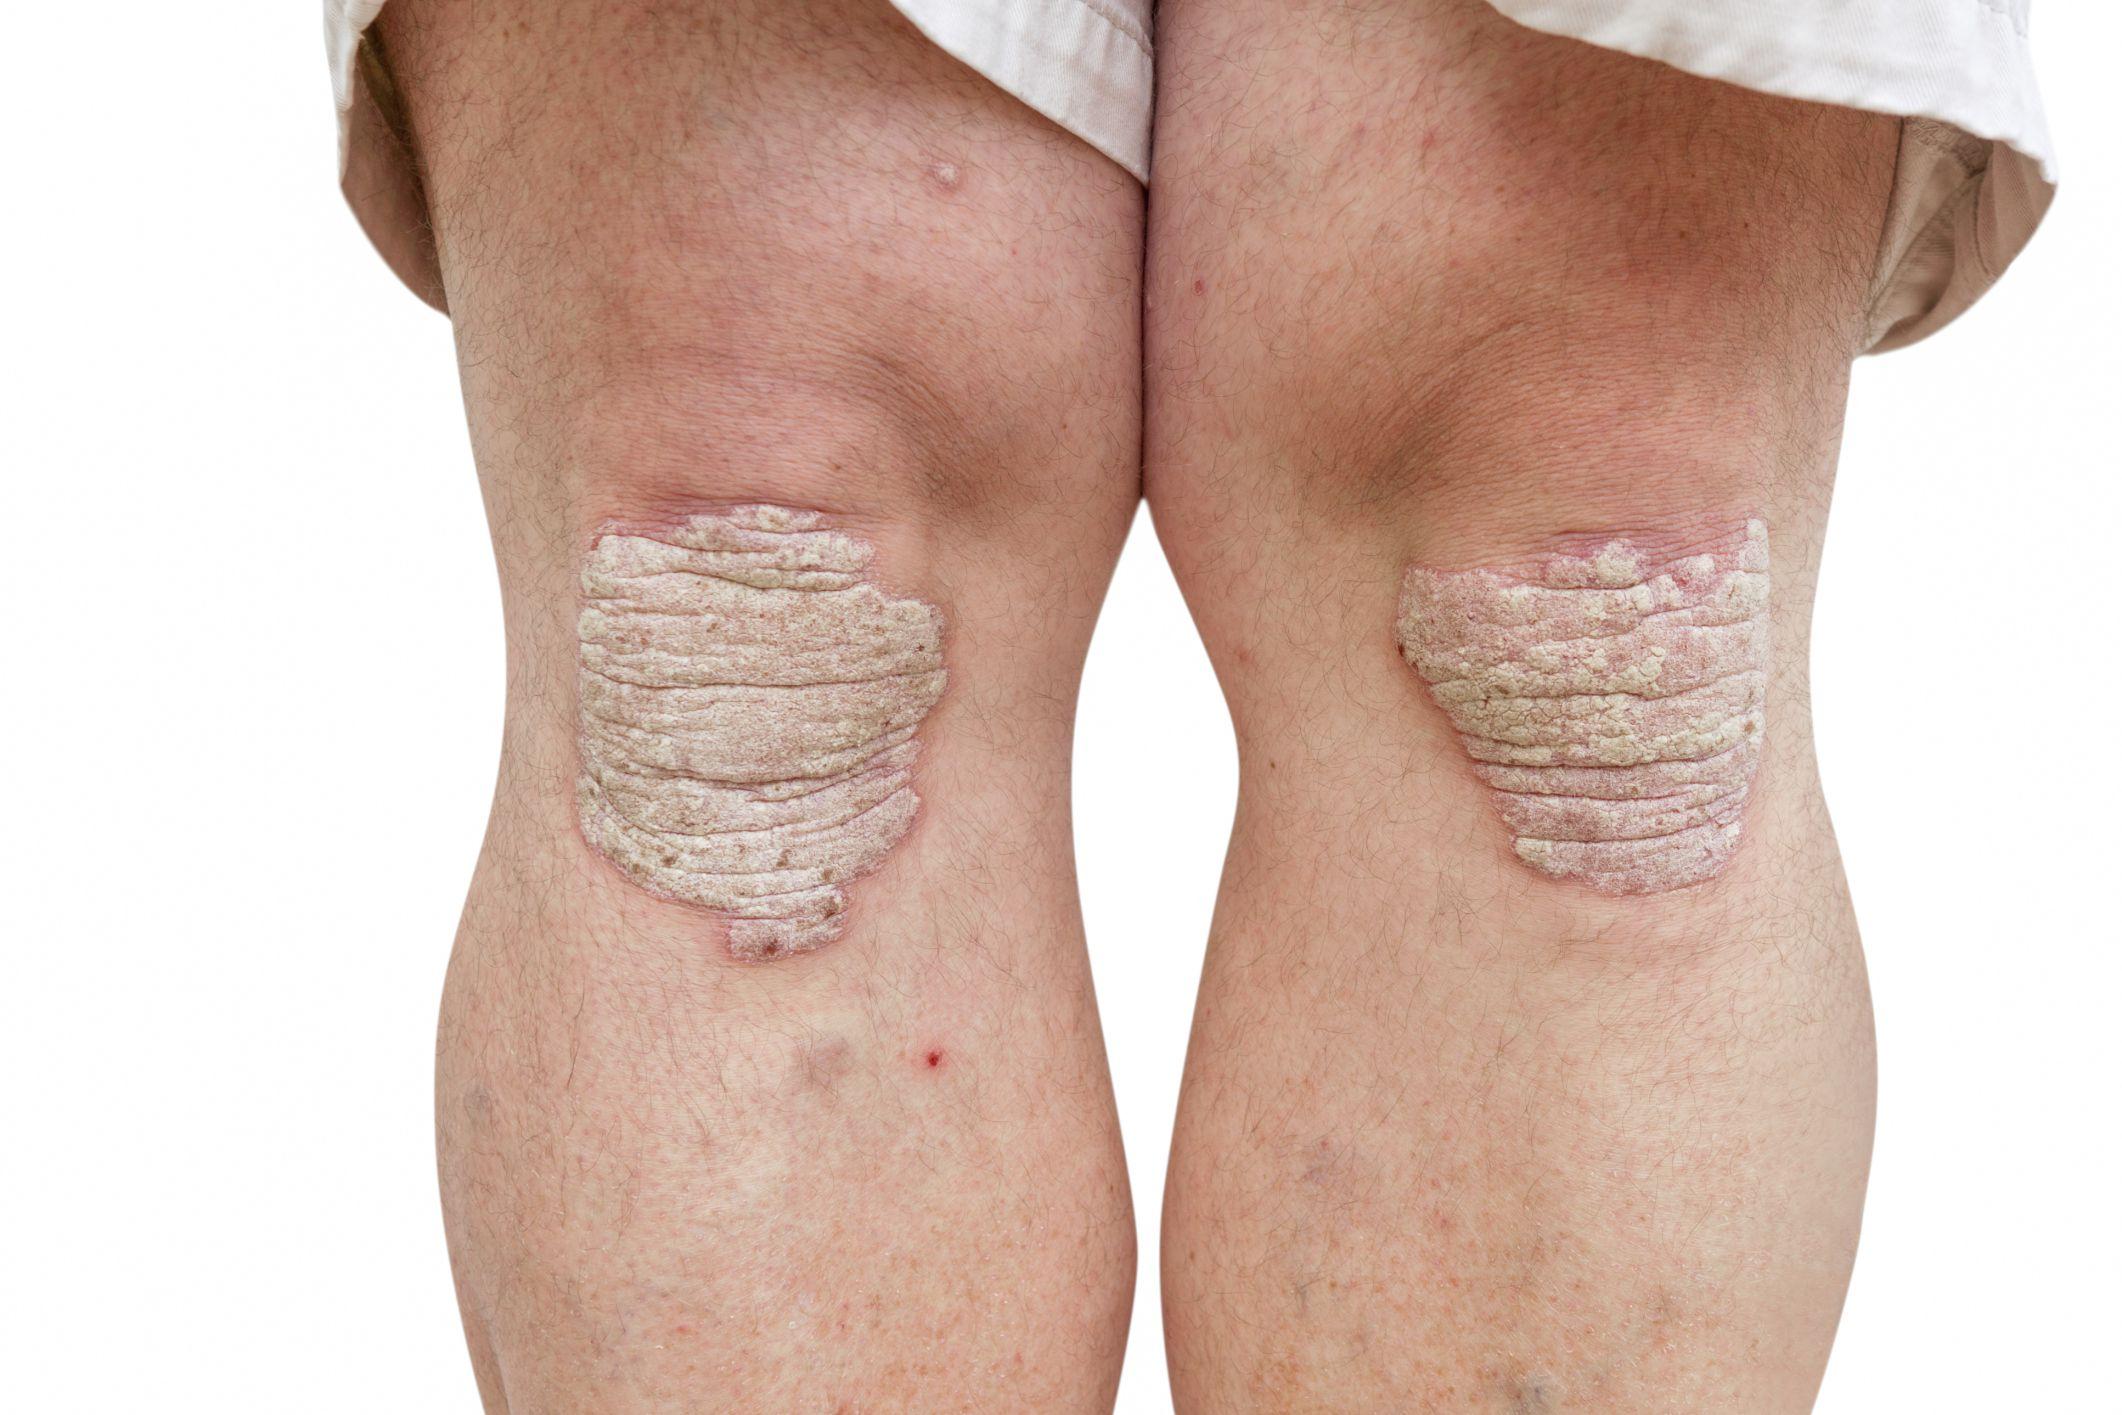 Psoriatic Arthritis - Recognizing the Signs and Symptoms